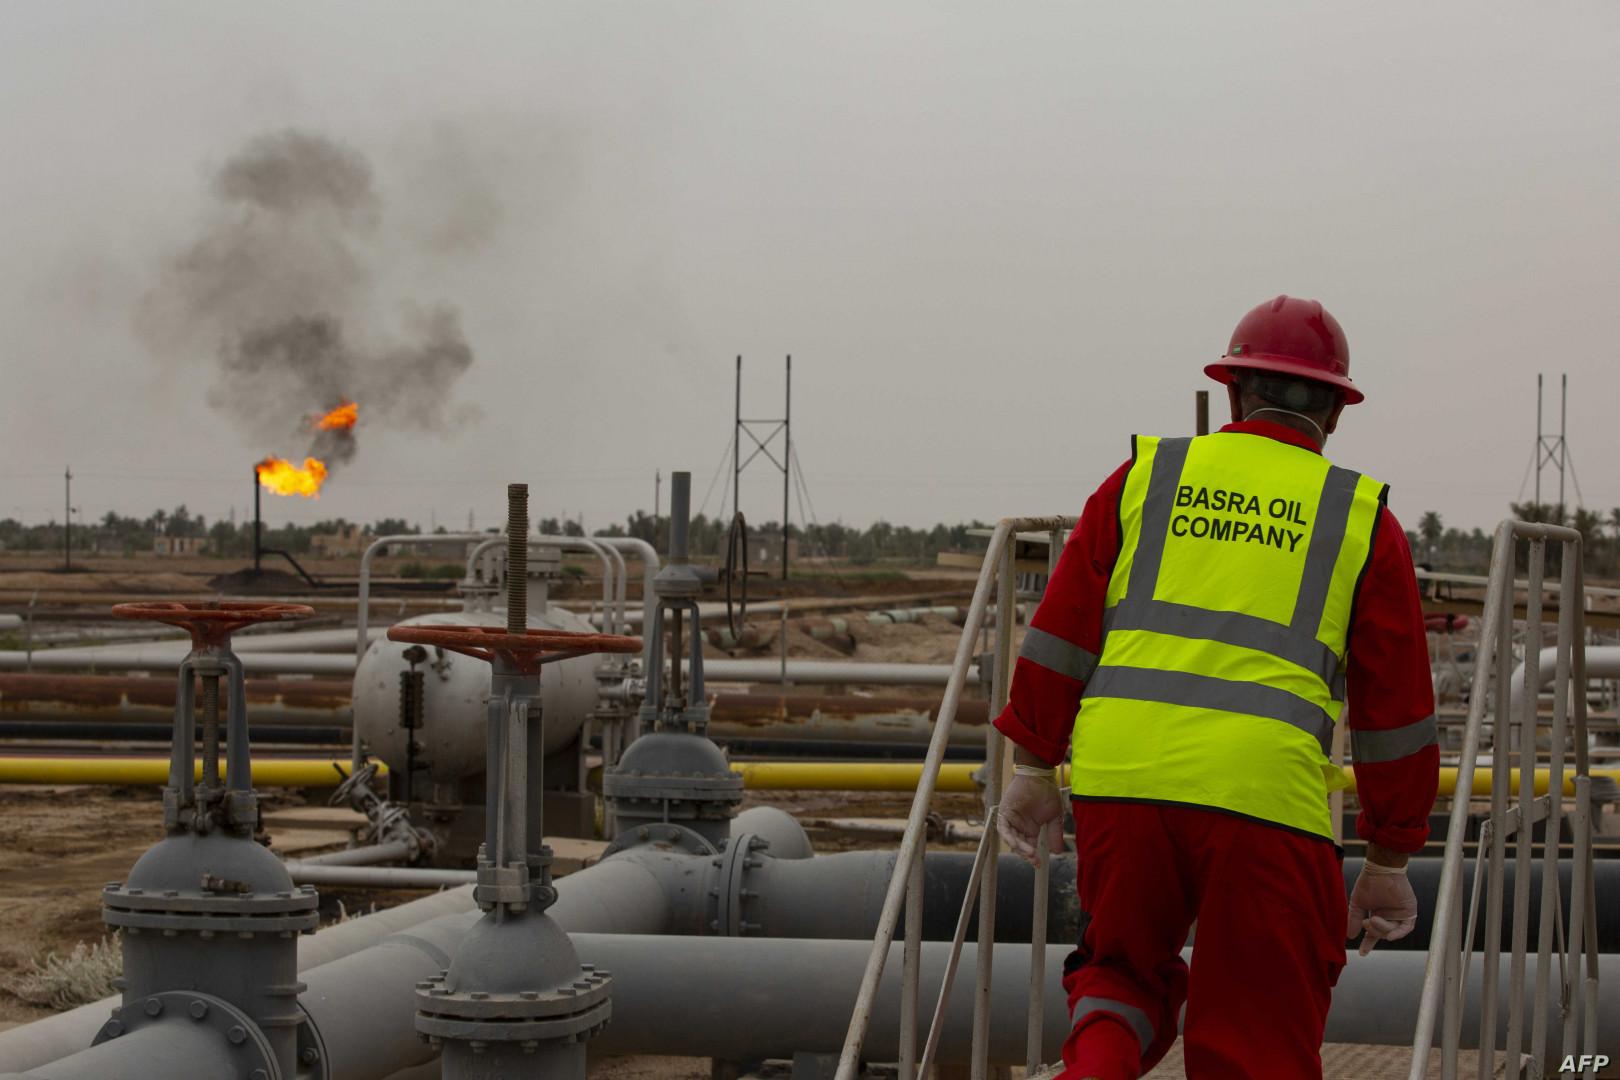 Basra Light Crude price reaches 70.18 dollars